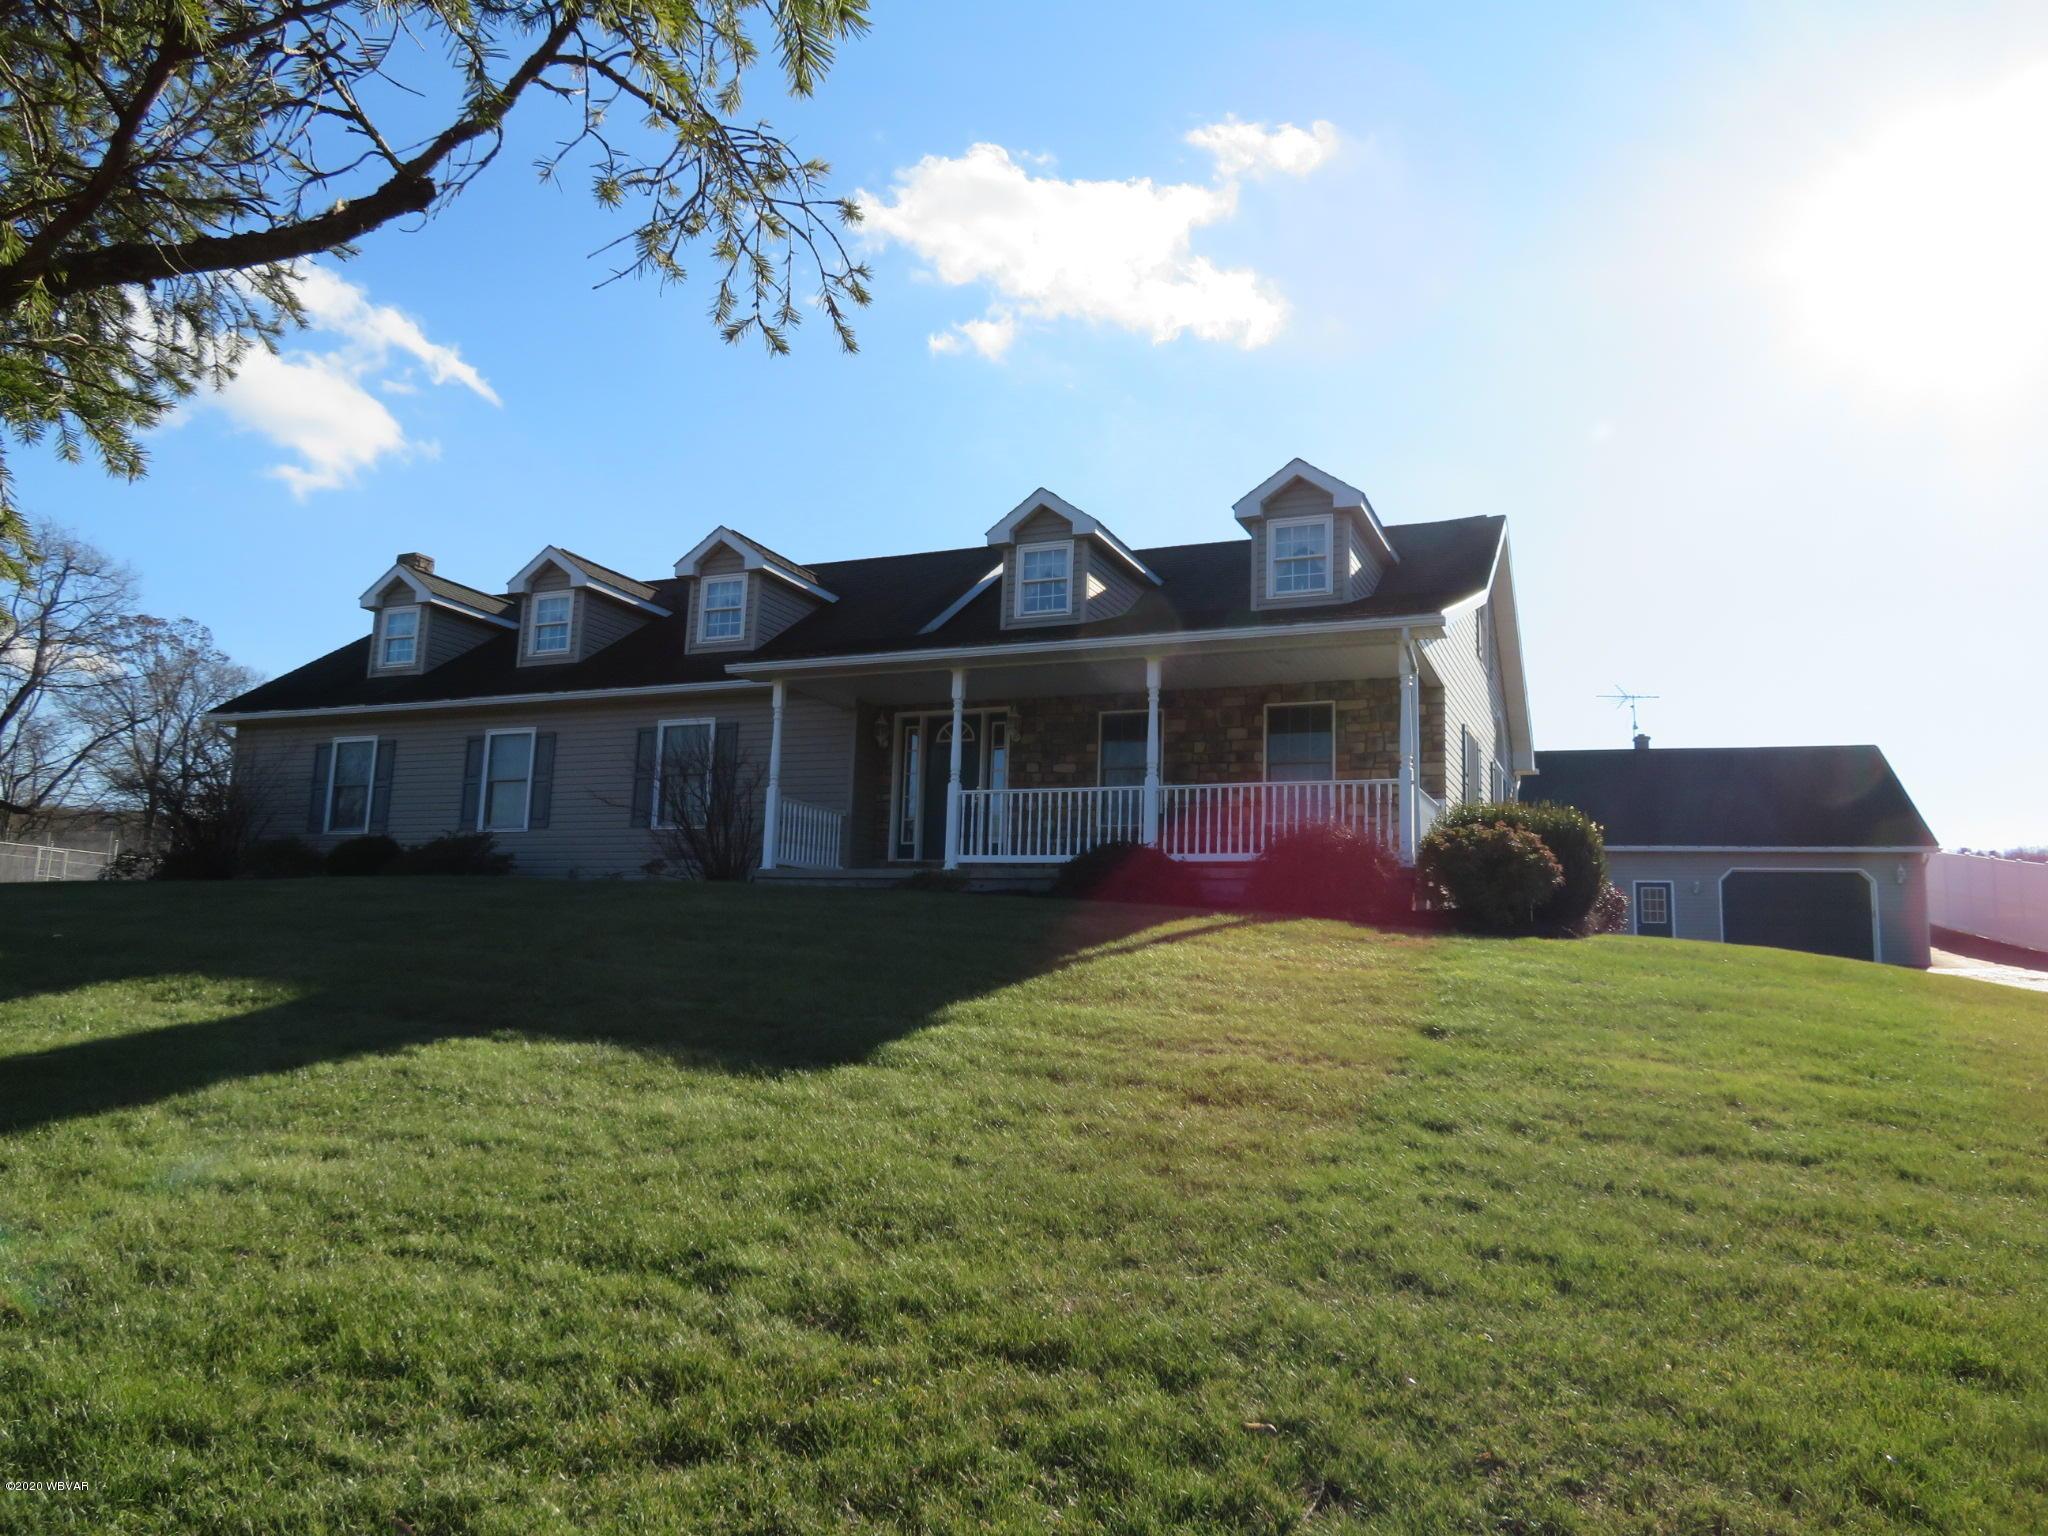 1971 POTATO VALLEY ROAD, Mt Pleasant Mills, PA 17853, 4 Bedrooms Bedrooms, ,4 BathroomsBathrooms,Residential,For sale,POTATO VALLEY,WB-89384